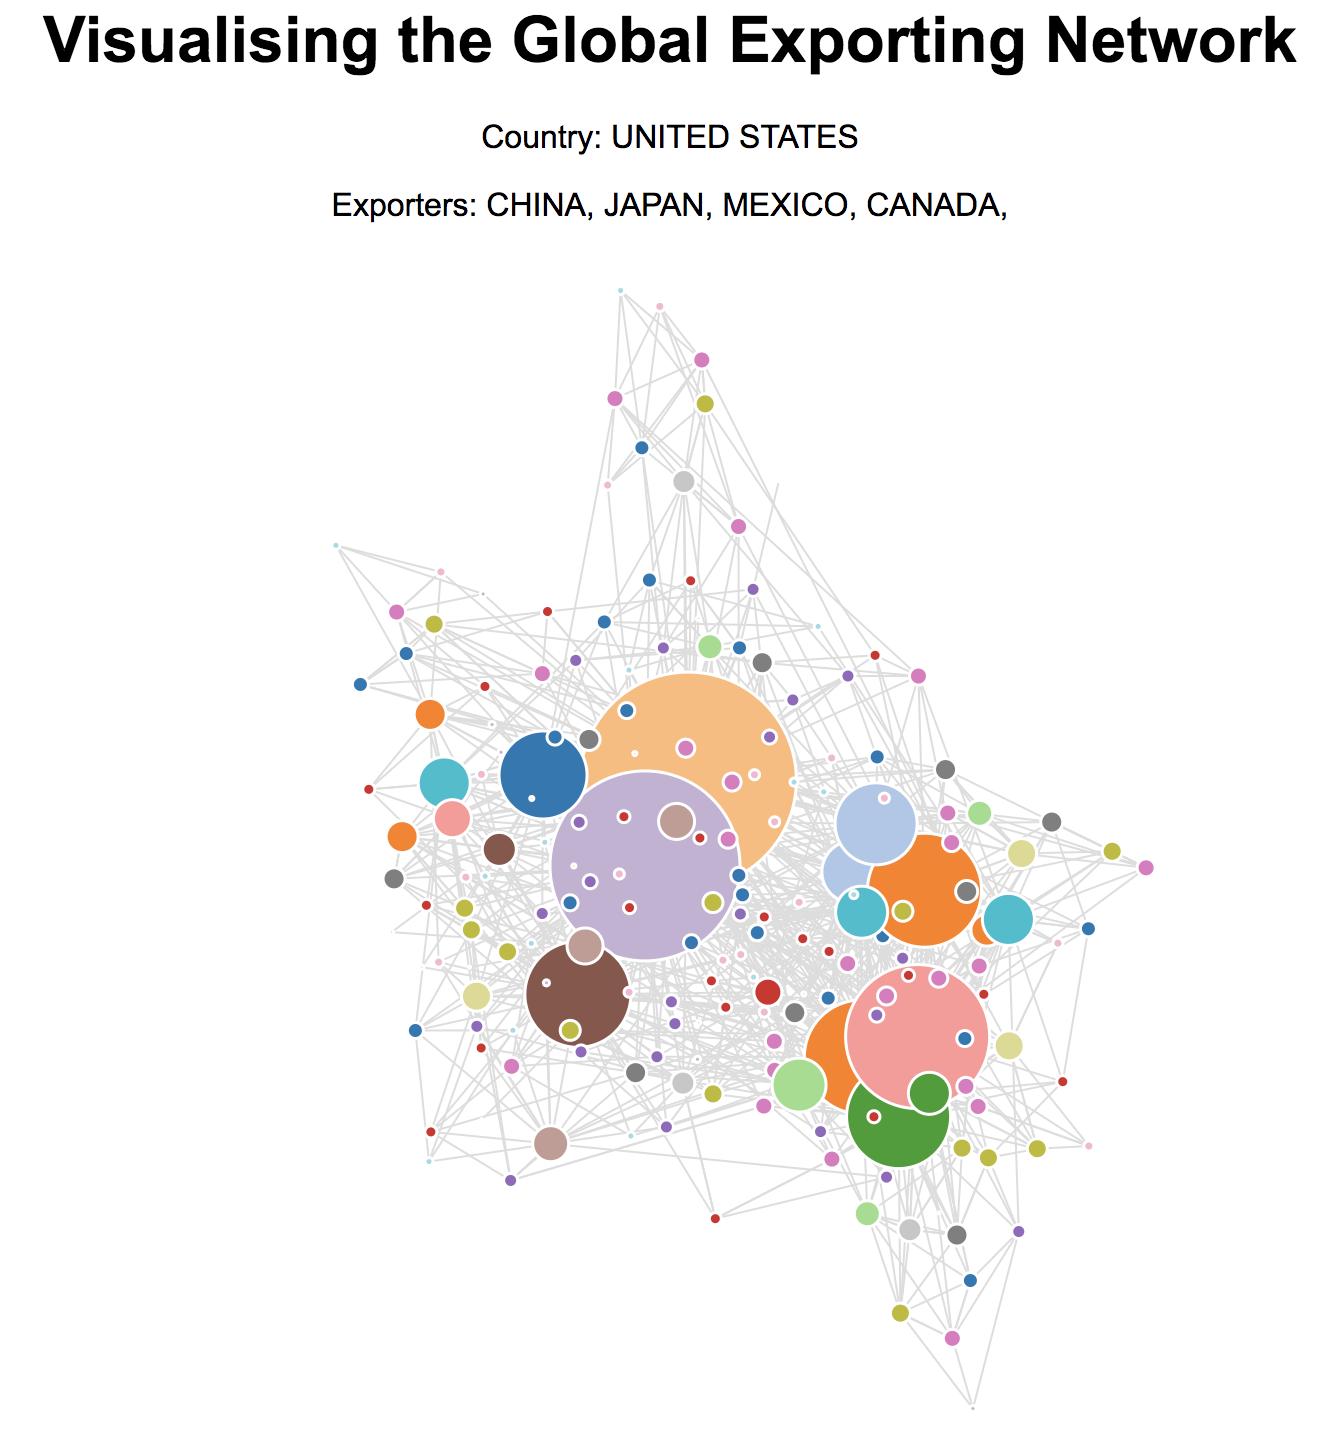 Global Exporting Network